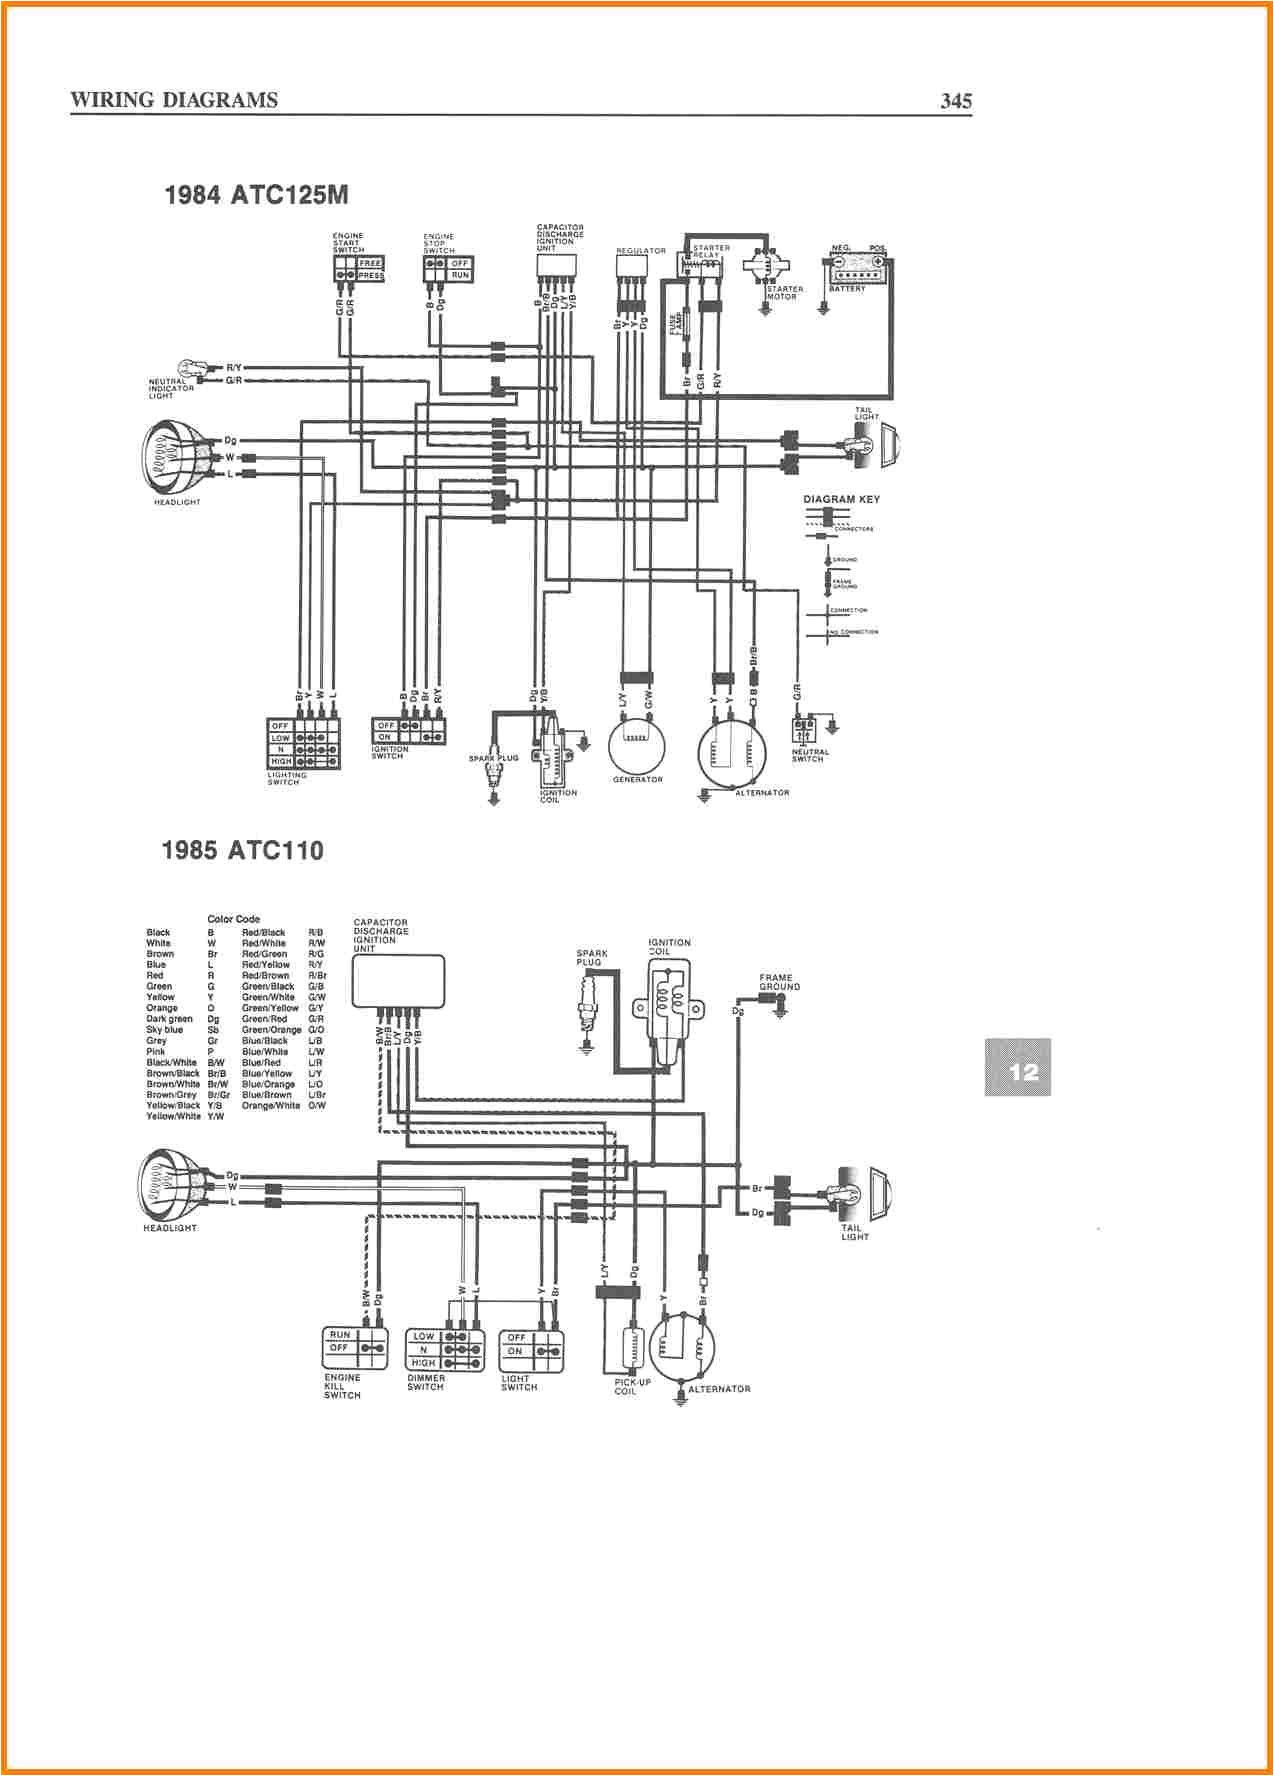 tao vip 49cc wiring diagram wiring diagram inside tao tao moped wiring diagram wiring diagram local